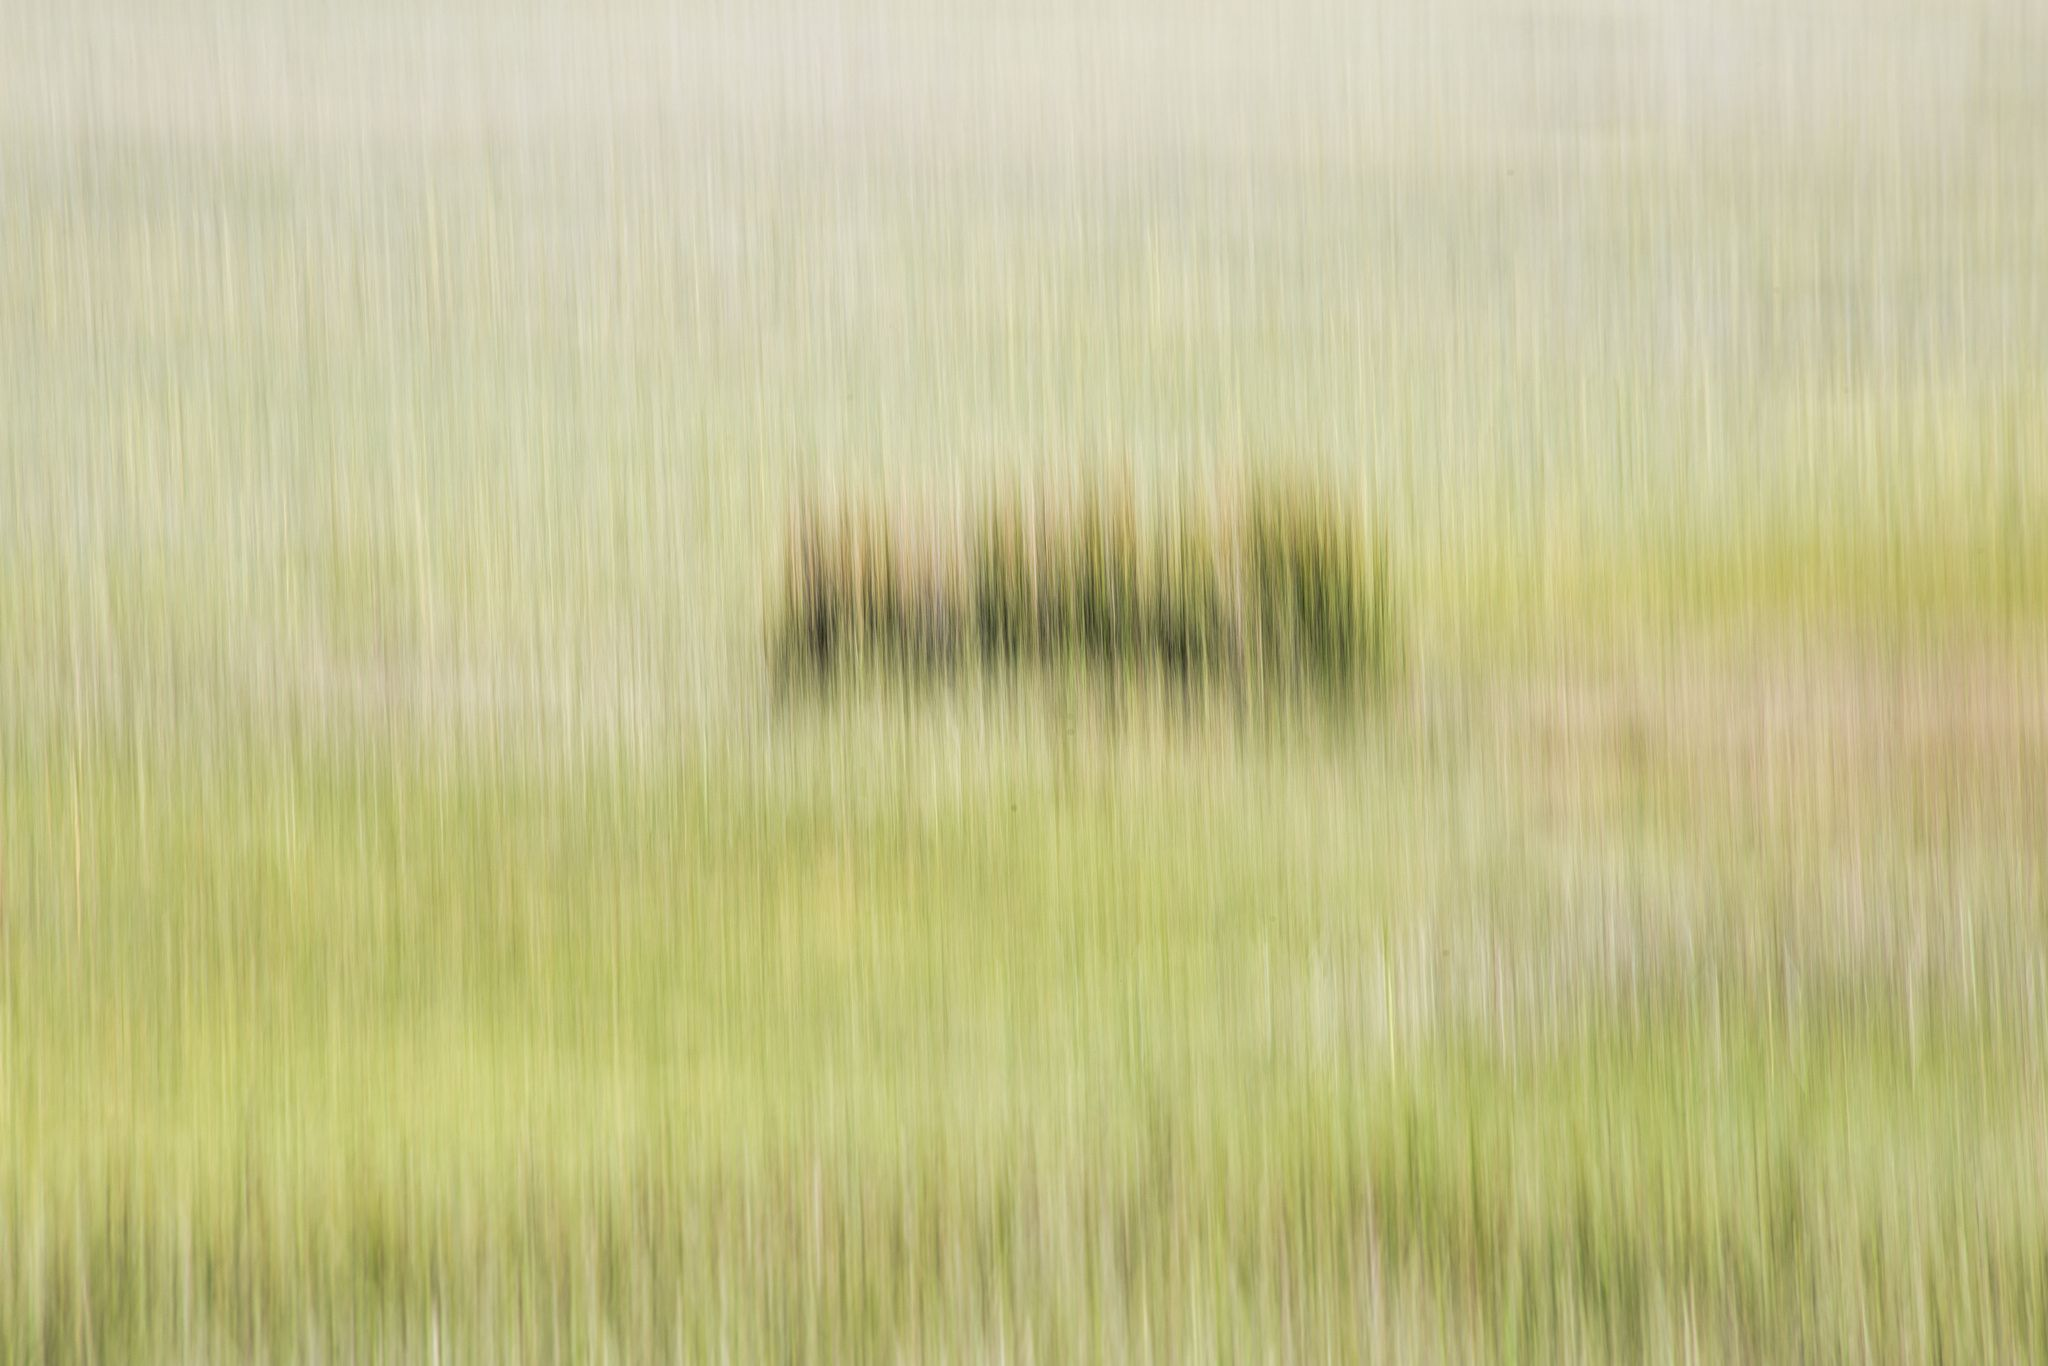 Coastal Grasses #3 by Ed Morris on 500px